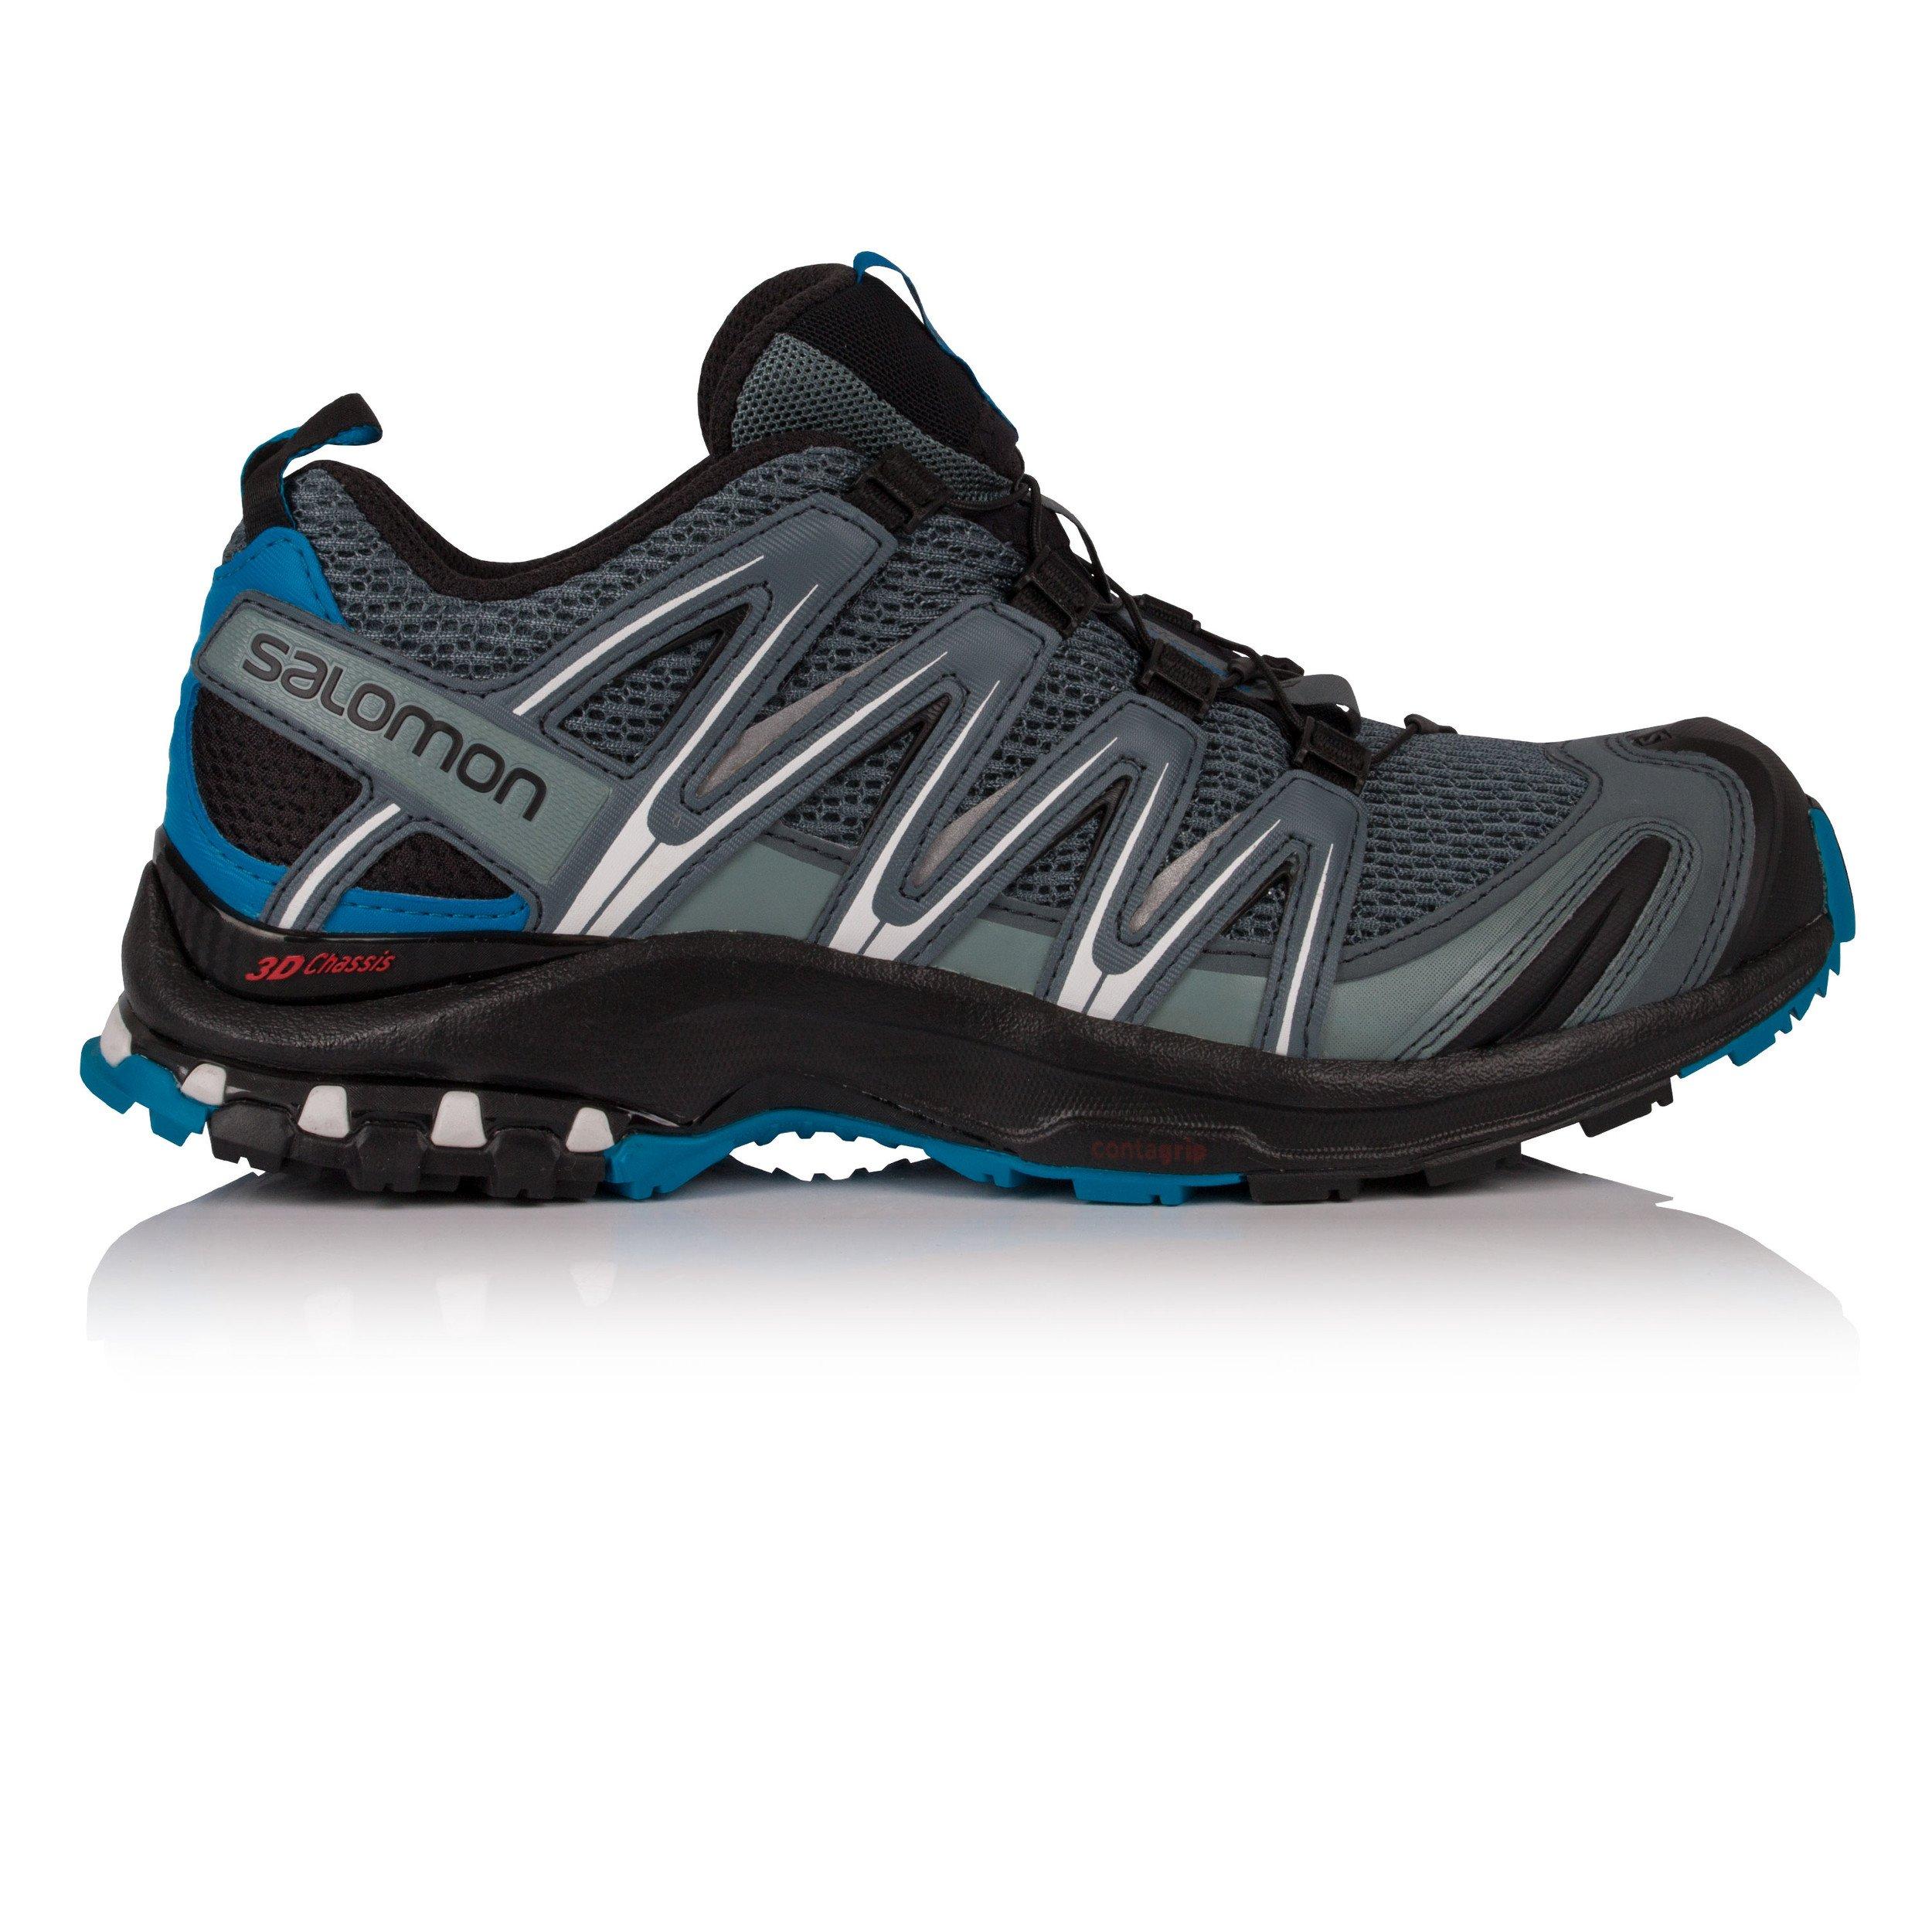 Salomon XA Pro 3D Trail Running Shoe - Men's, Stormy Weather/Black/Hawaiian Surf, 14 L40074500-14 by Salomon